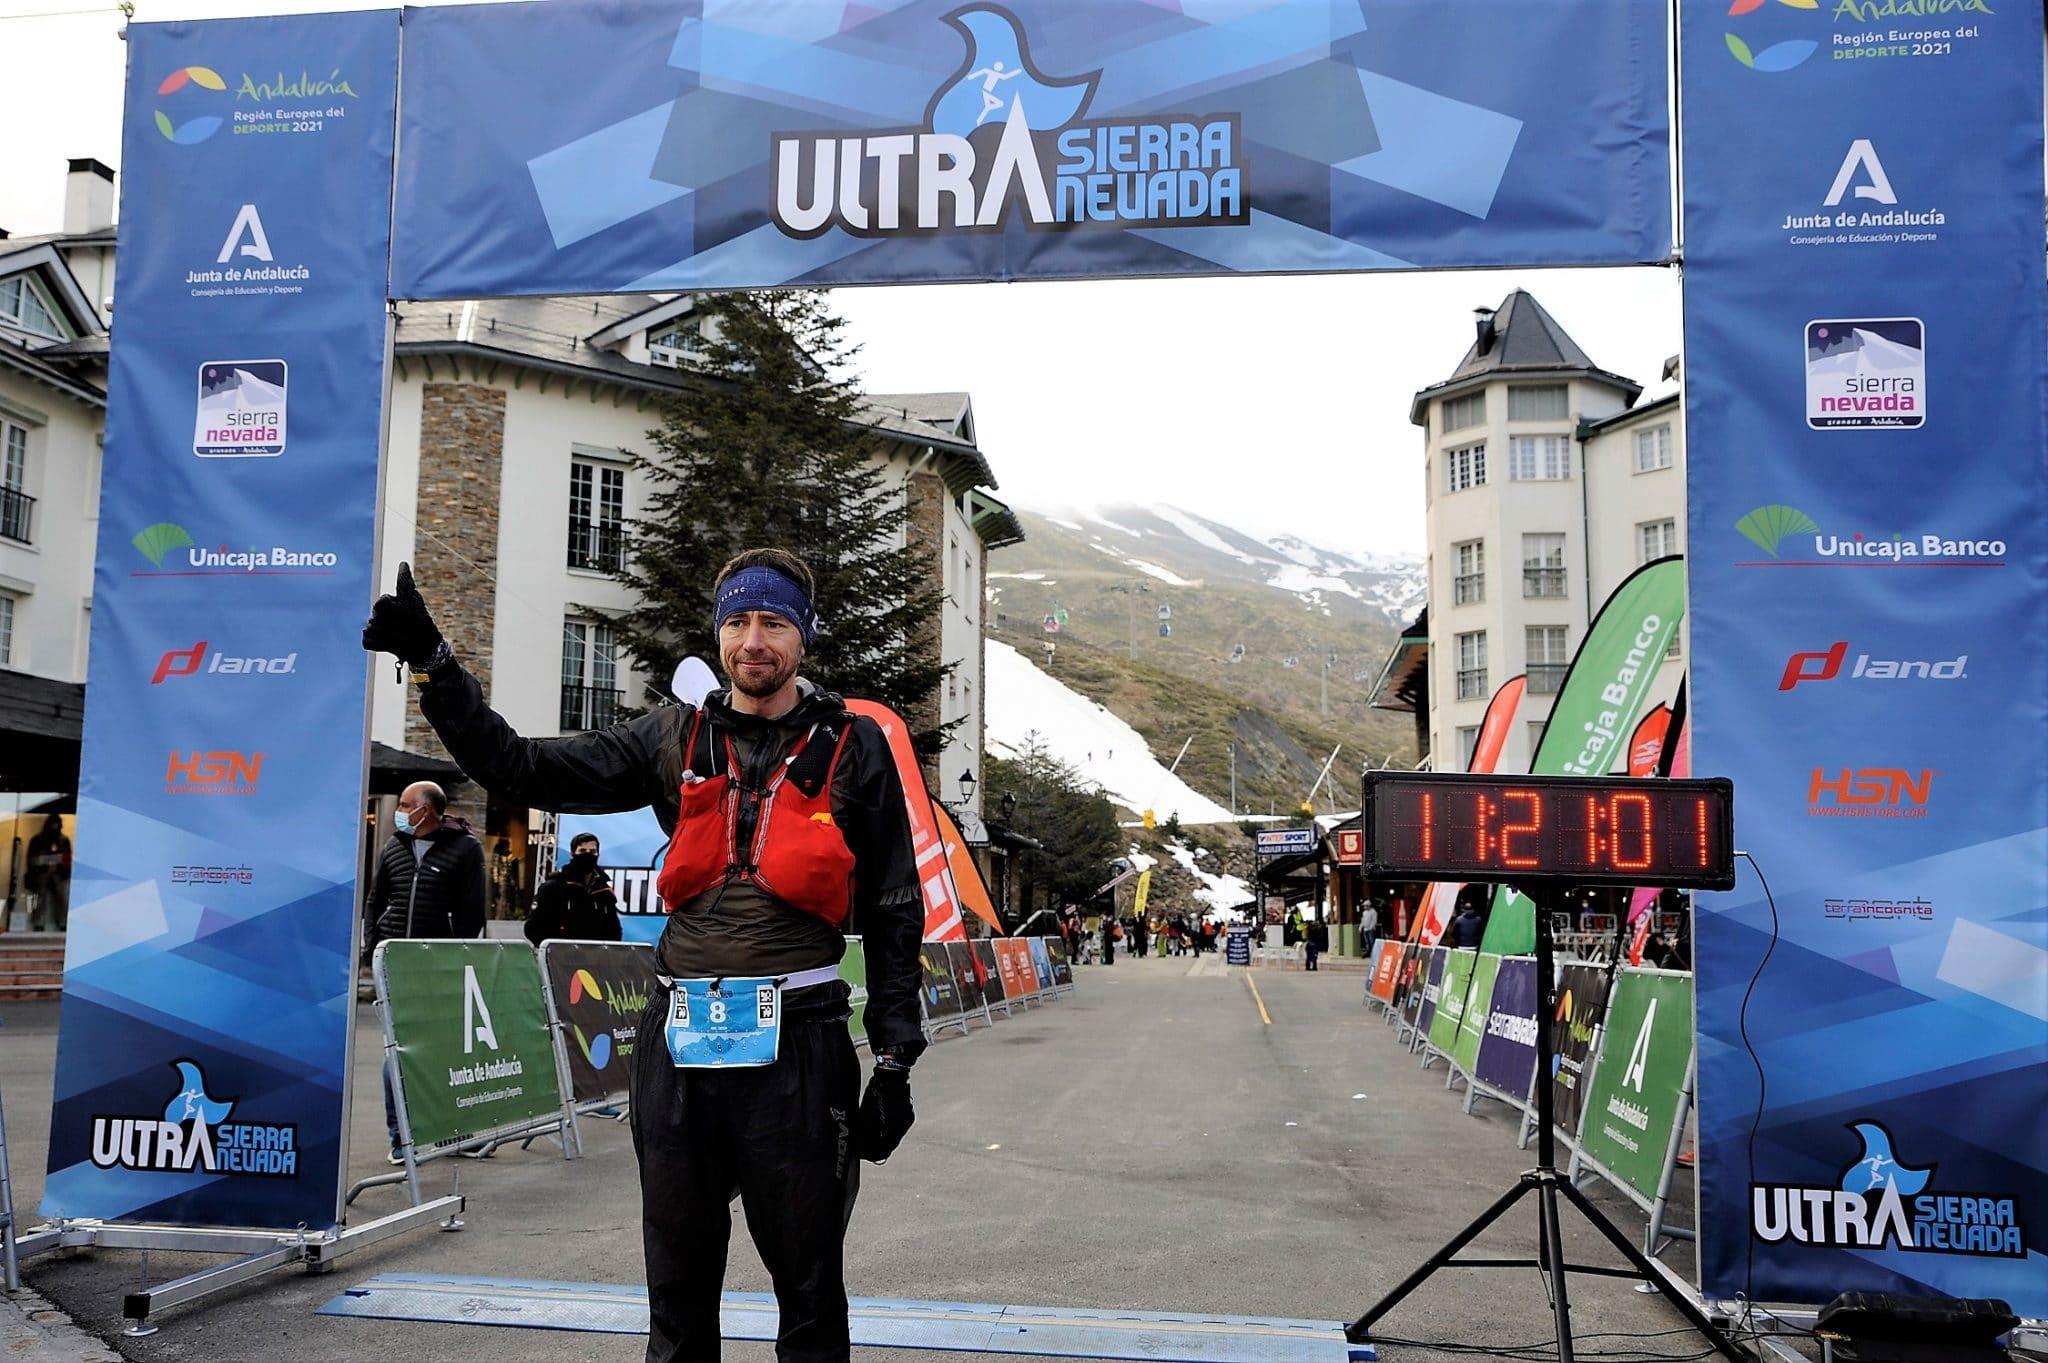 Ultra Sierra Nevada Ionel Cristian Manole